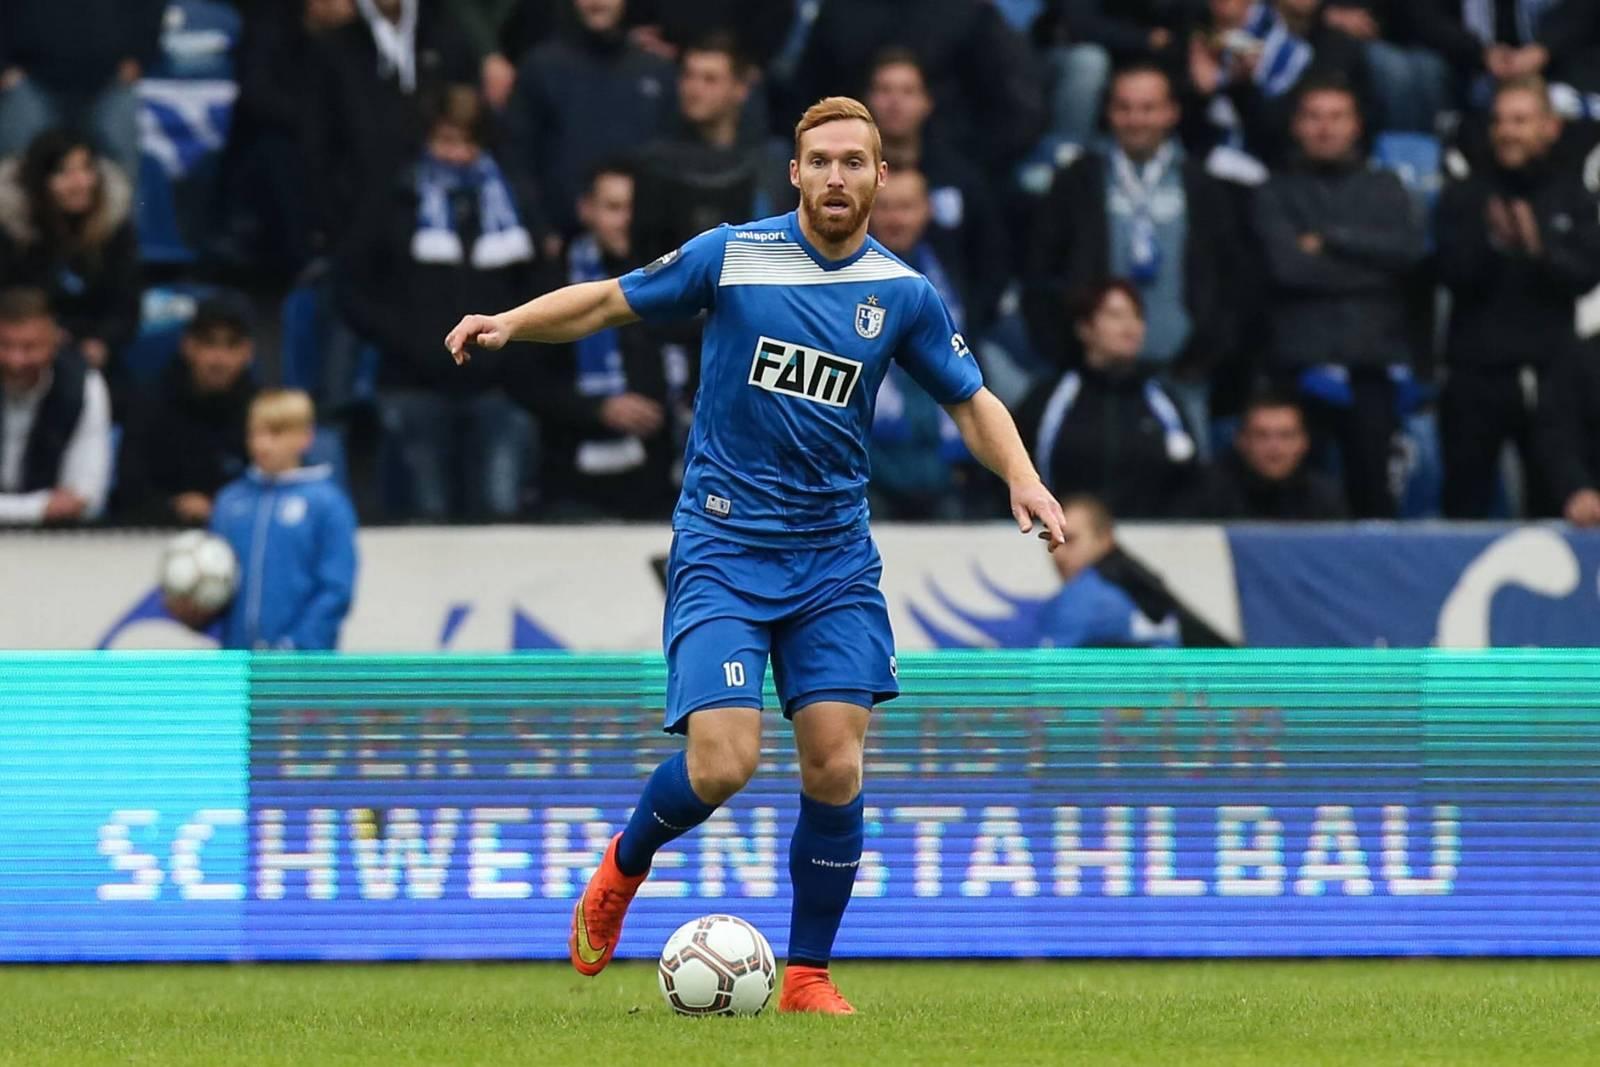 Mahnt zu Besonnenheit: FCM-Abwehrspieler Nico Hammann